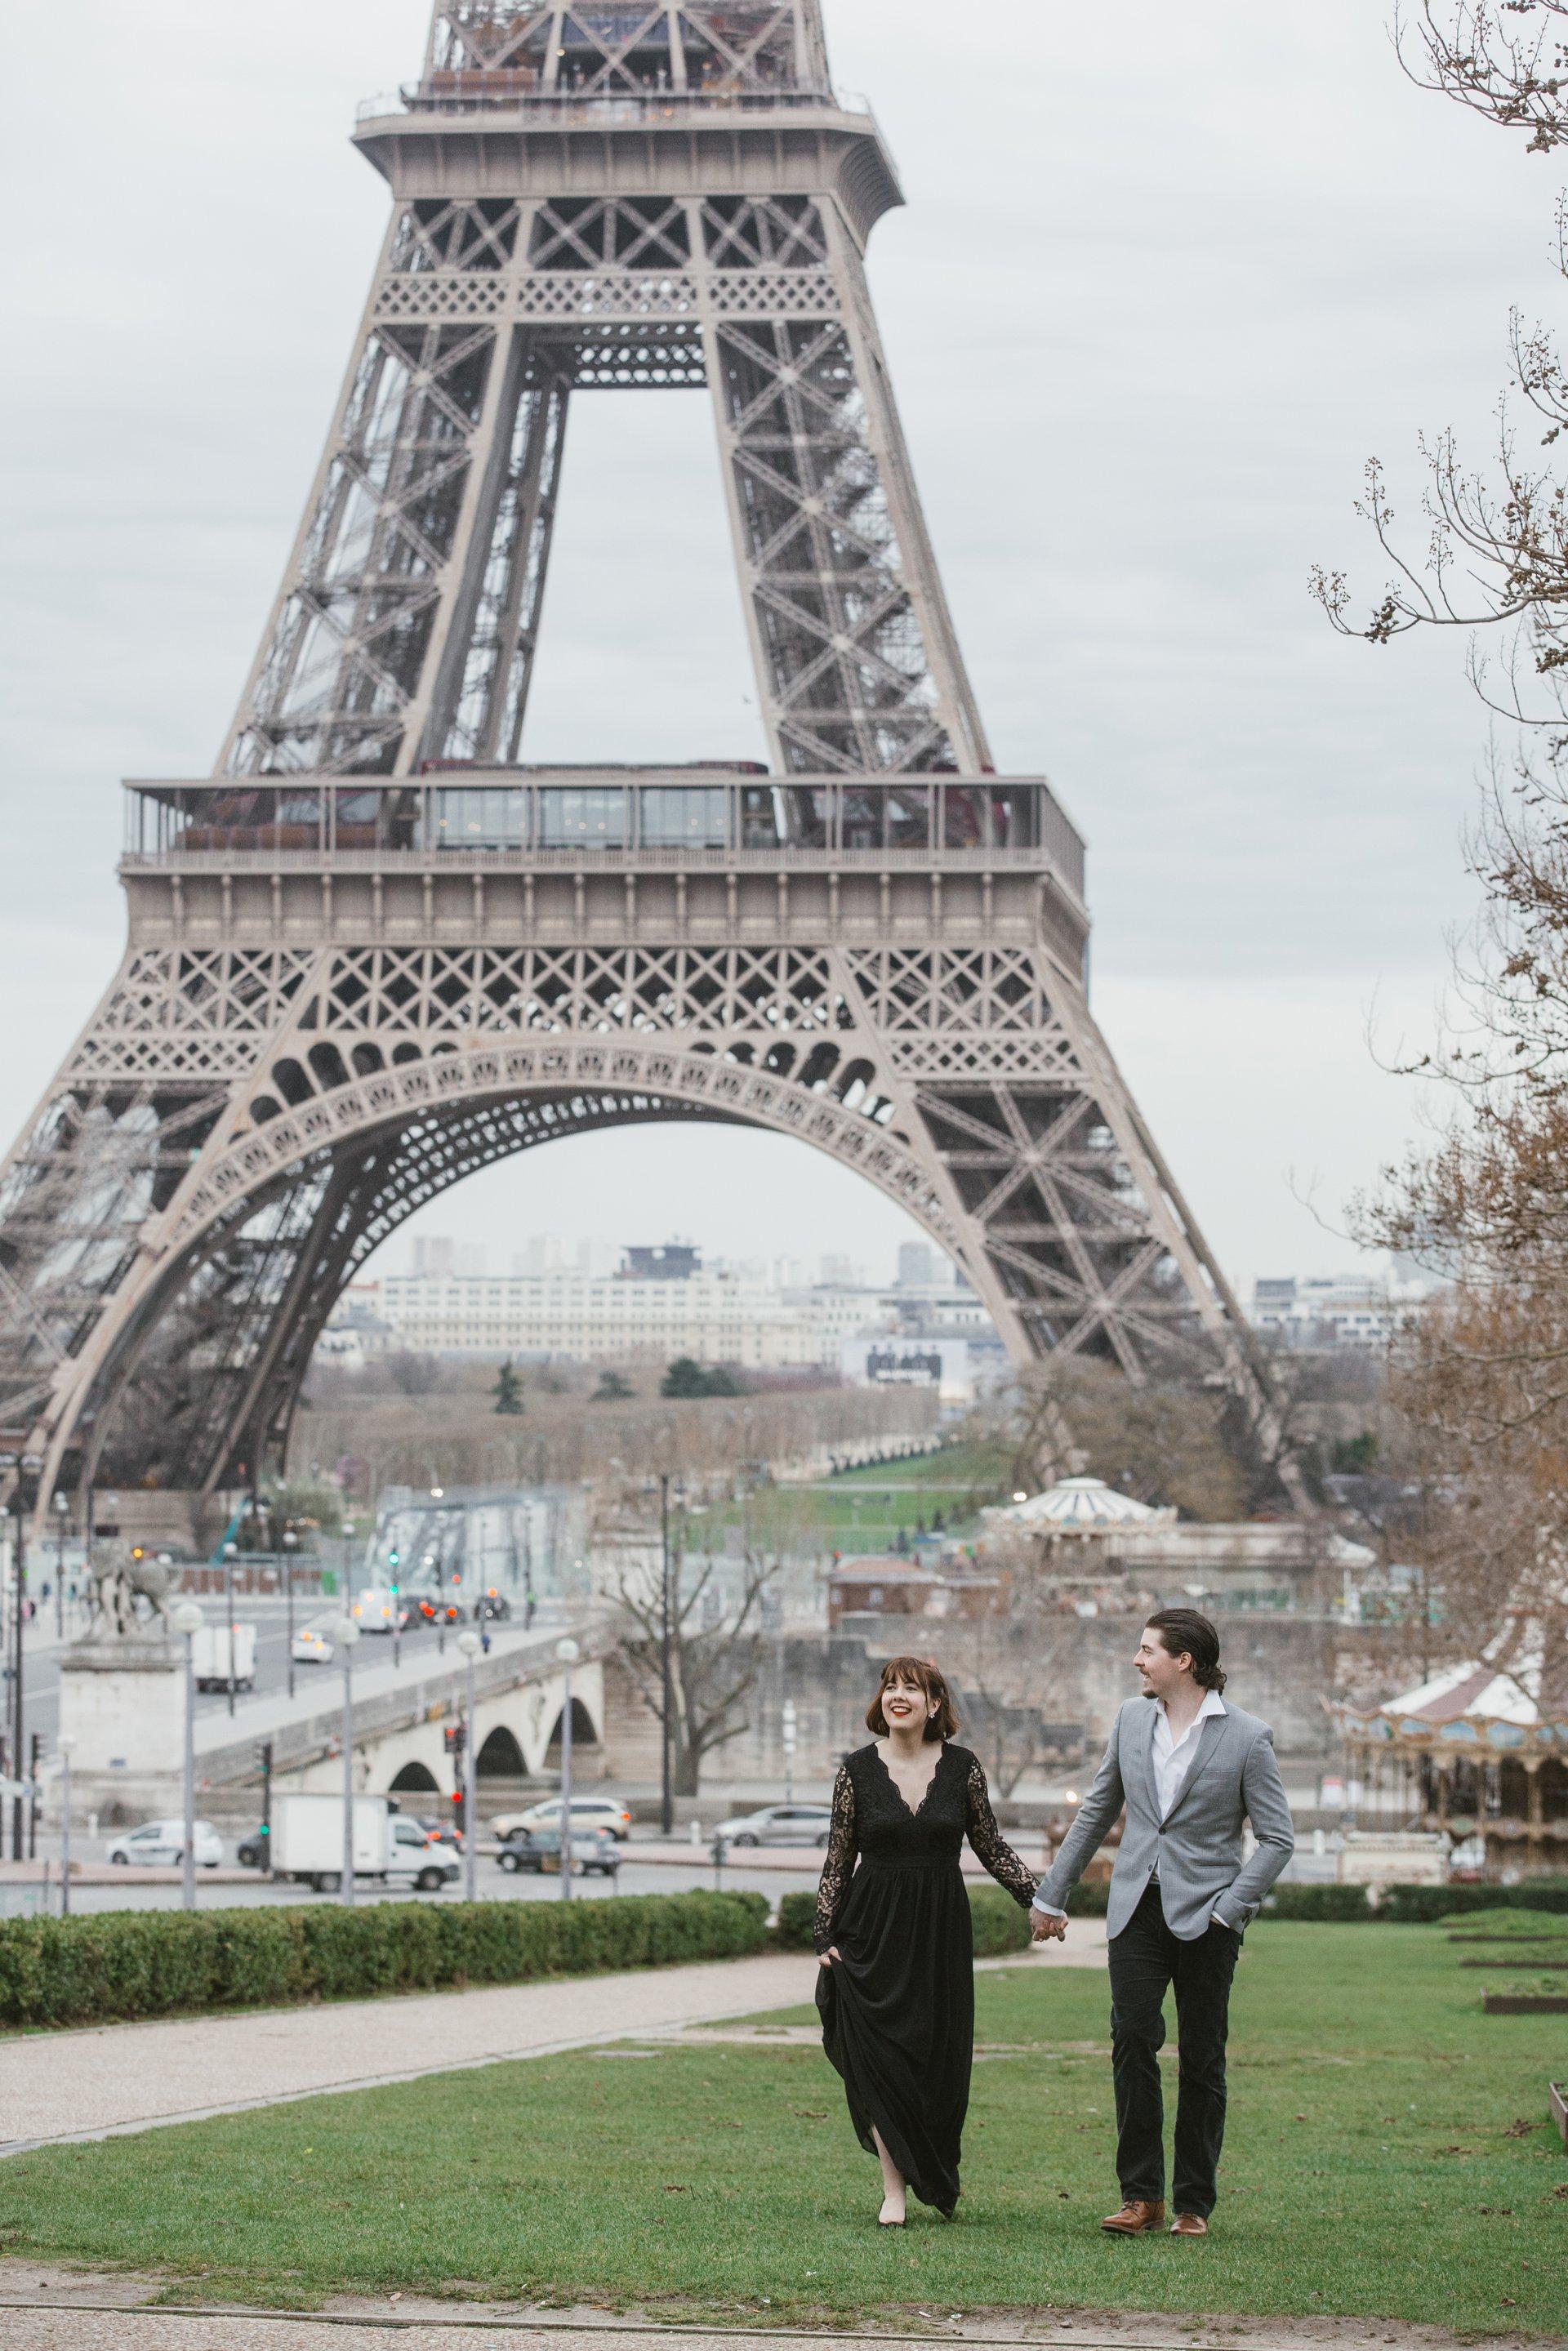 Paris-France-travel-story-Flytographer-10